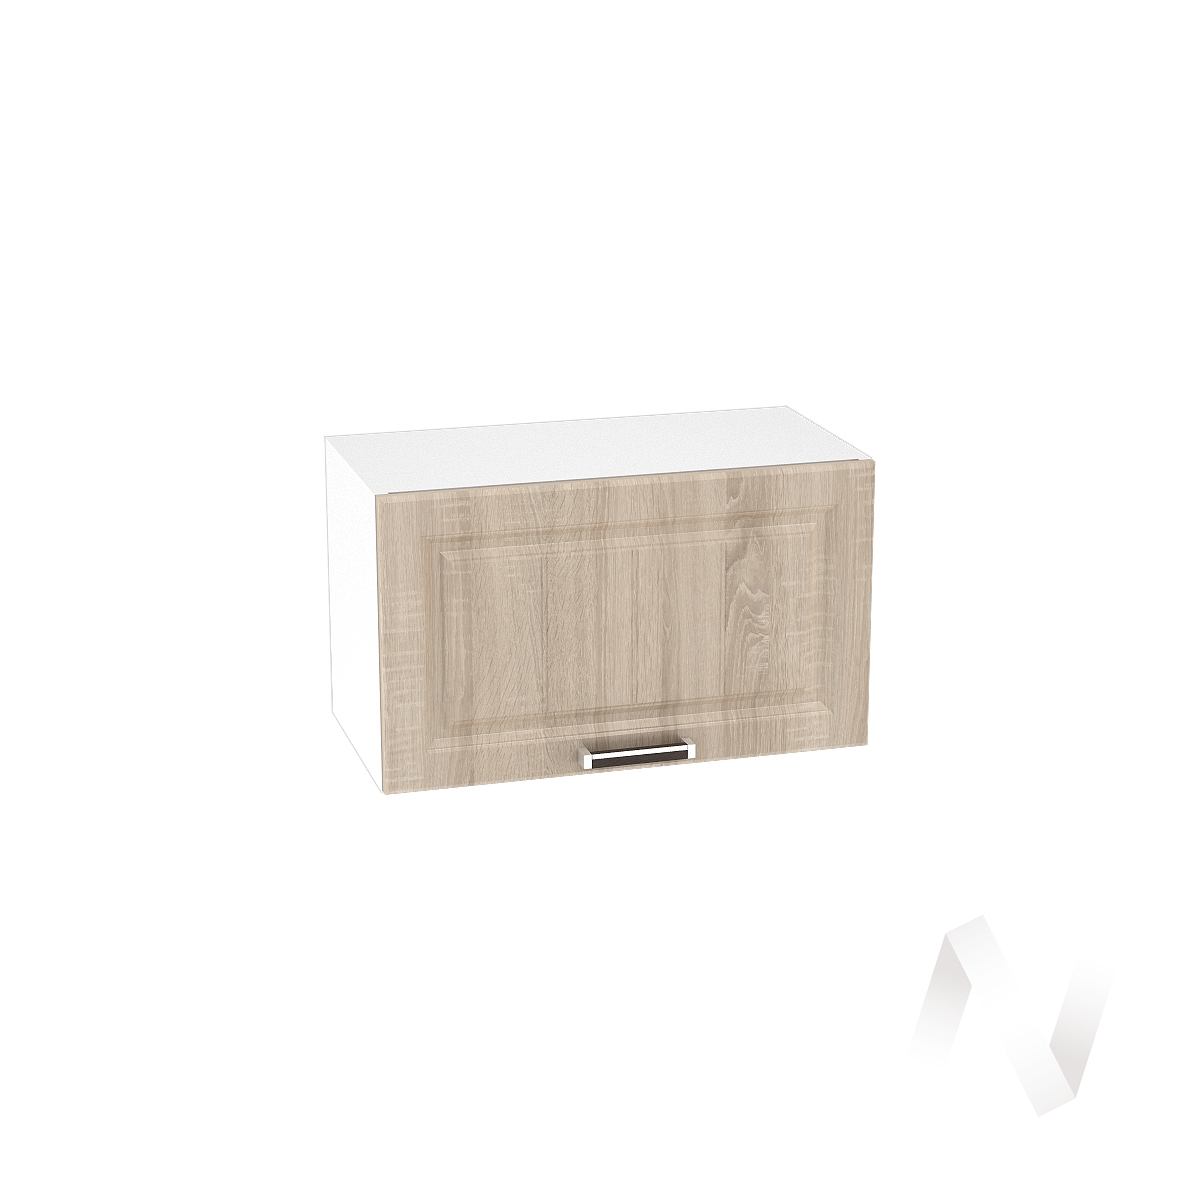 "Кухня ""Прага"": Шкаф верхний горизонтальный 600, ШВГ 600 (дуб сонома/корпус белый)"